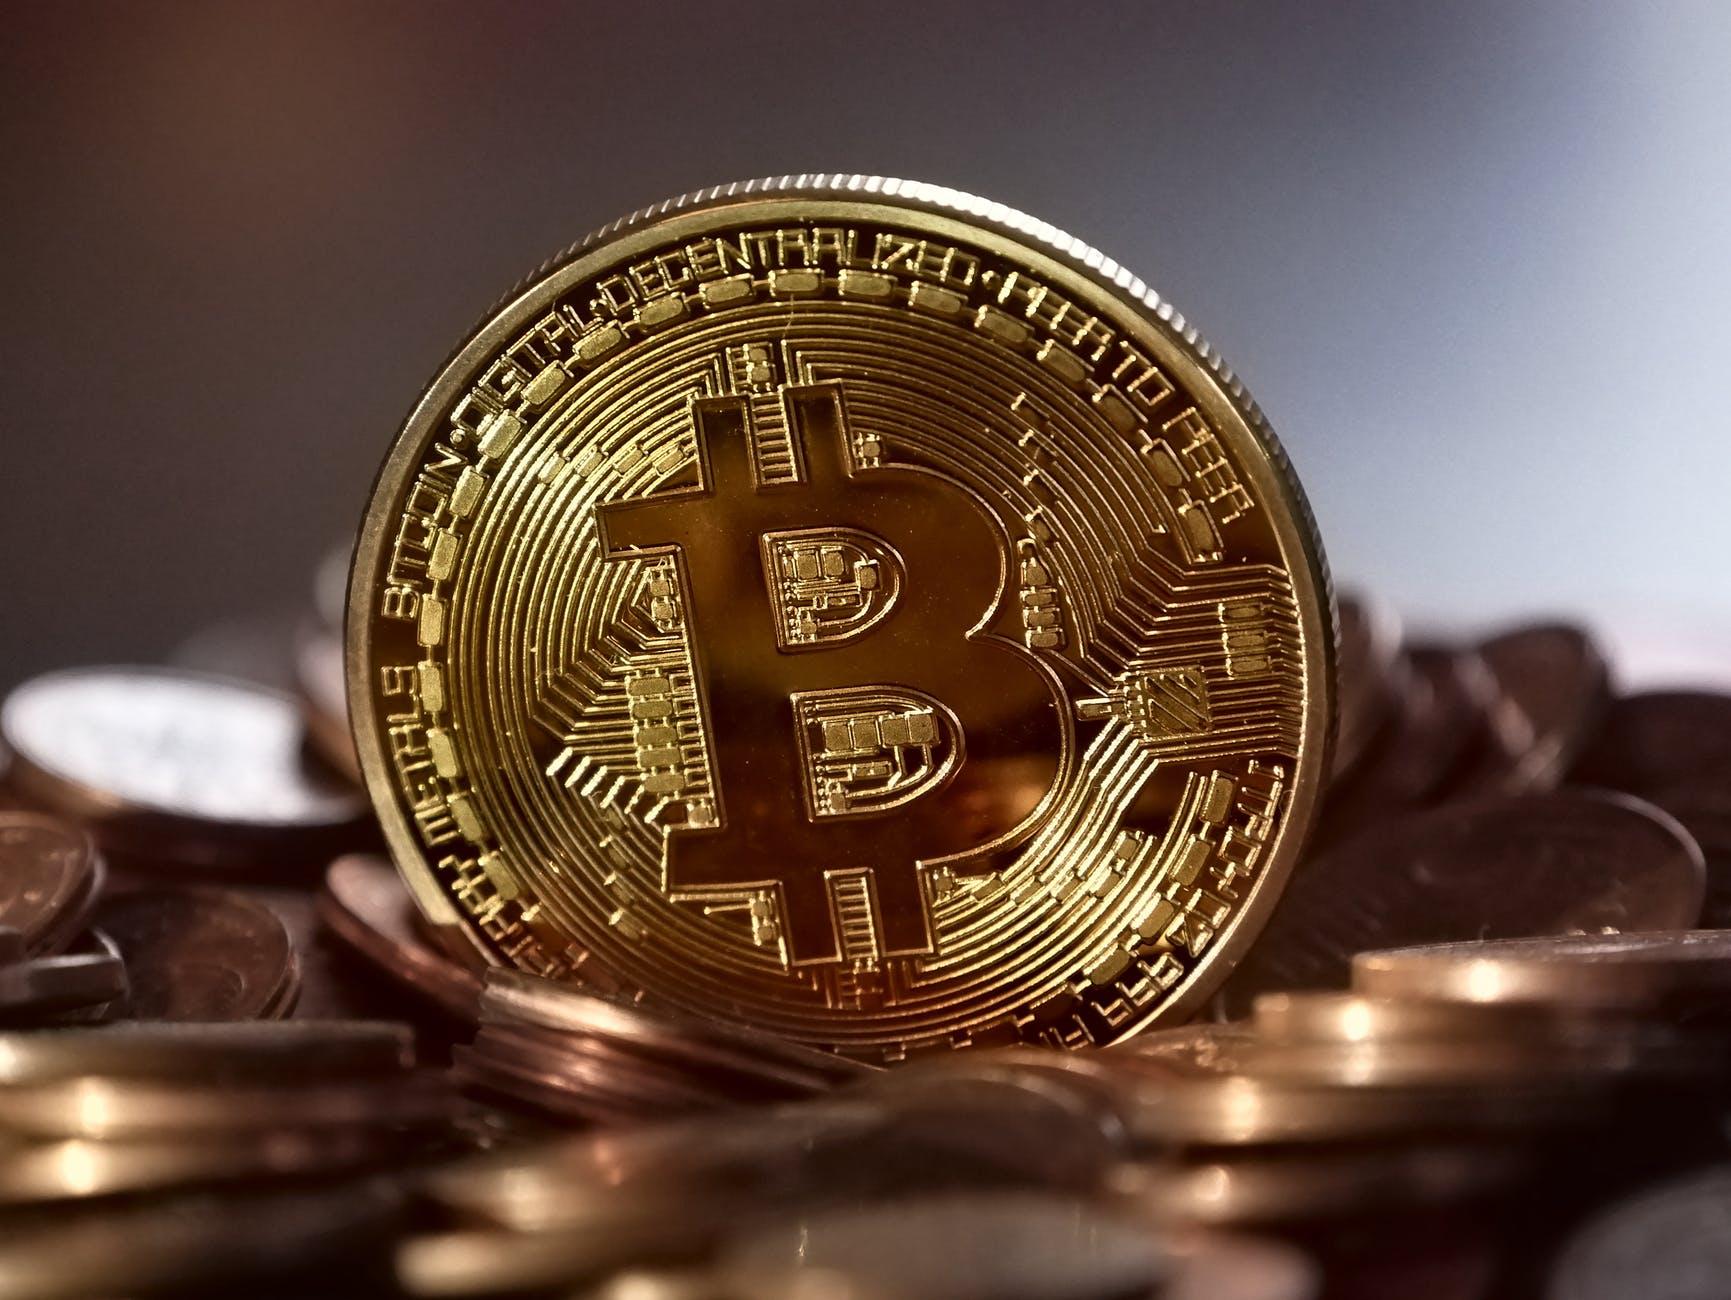 H Κίνα διώχνει τους κυνηγούς του Bitcoin θησαυρού από τα εδάφη της